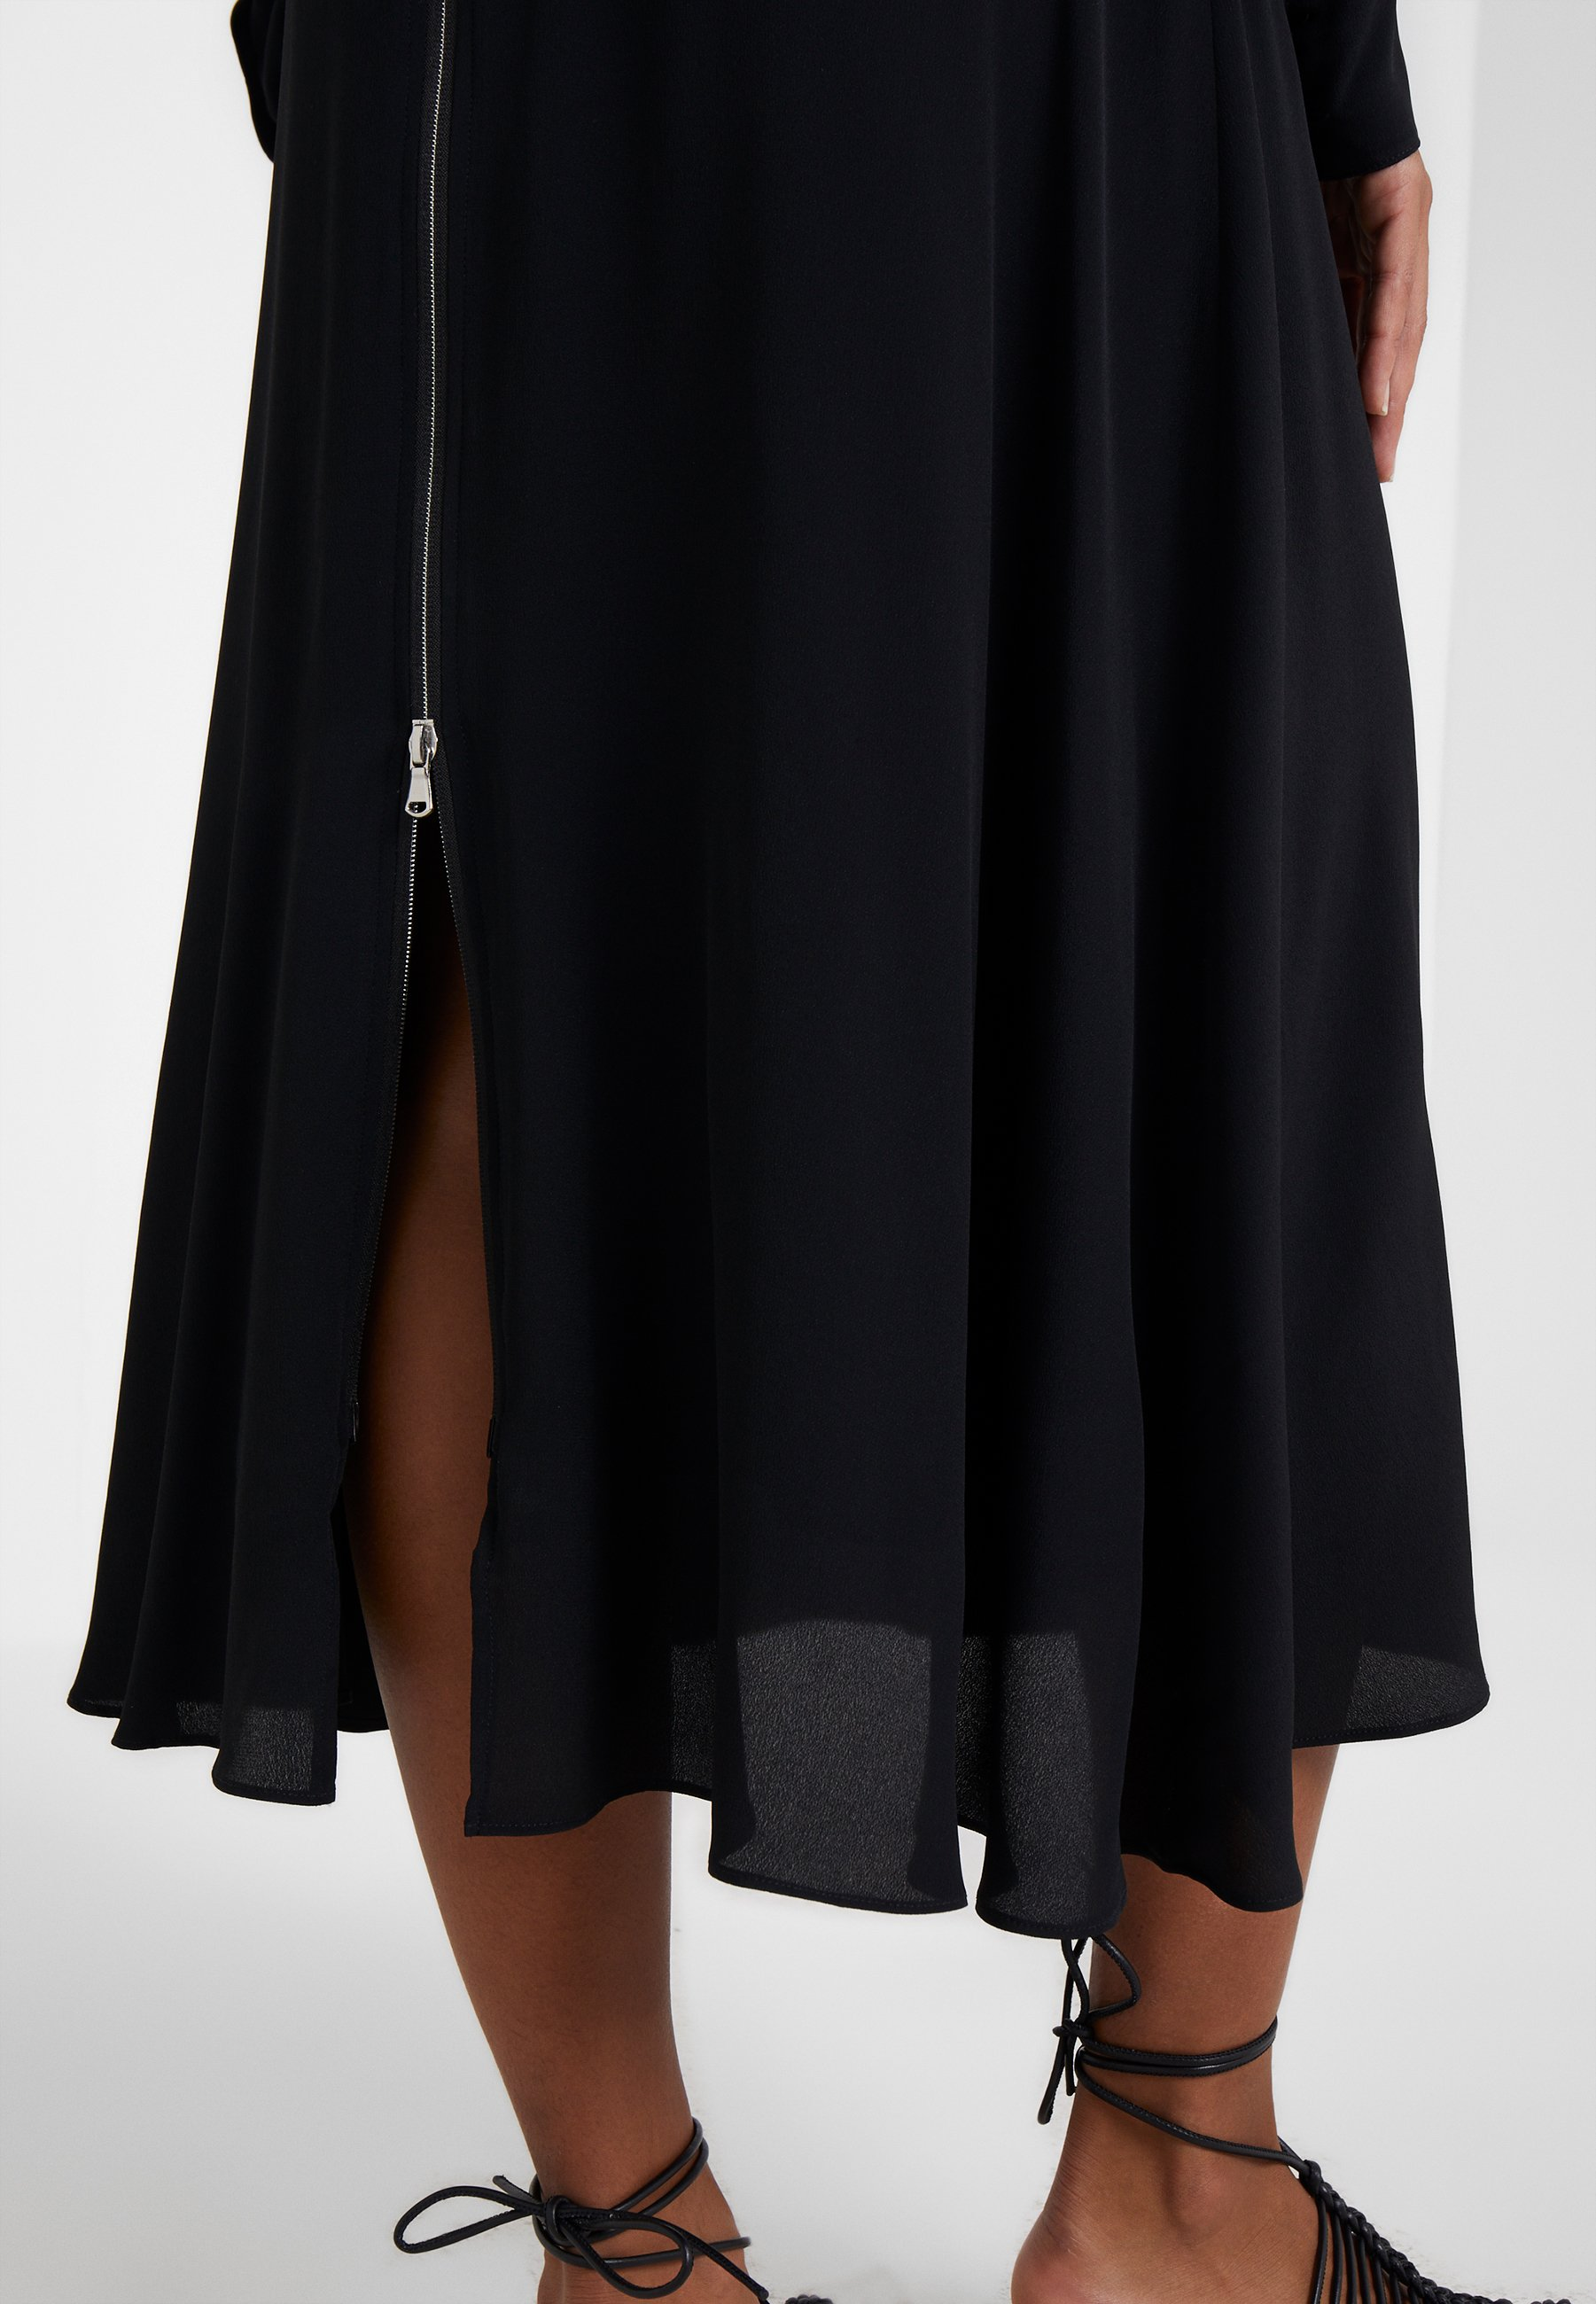 Sportmax Code Robe de soirée - noir schwarz